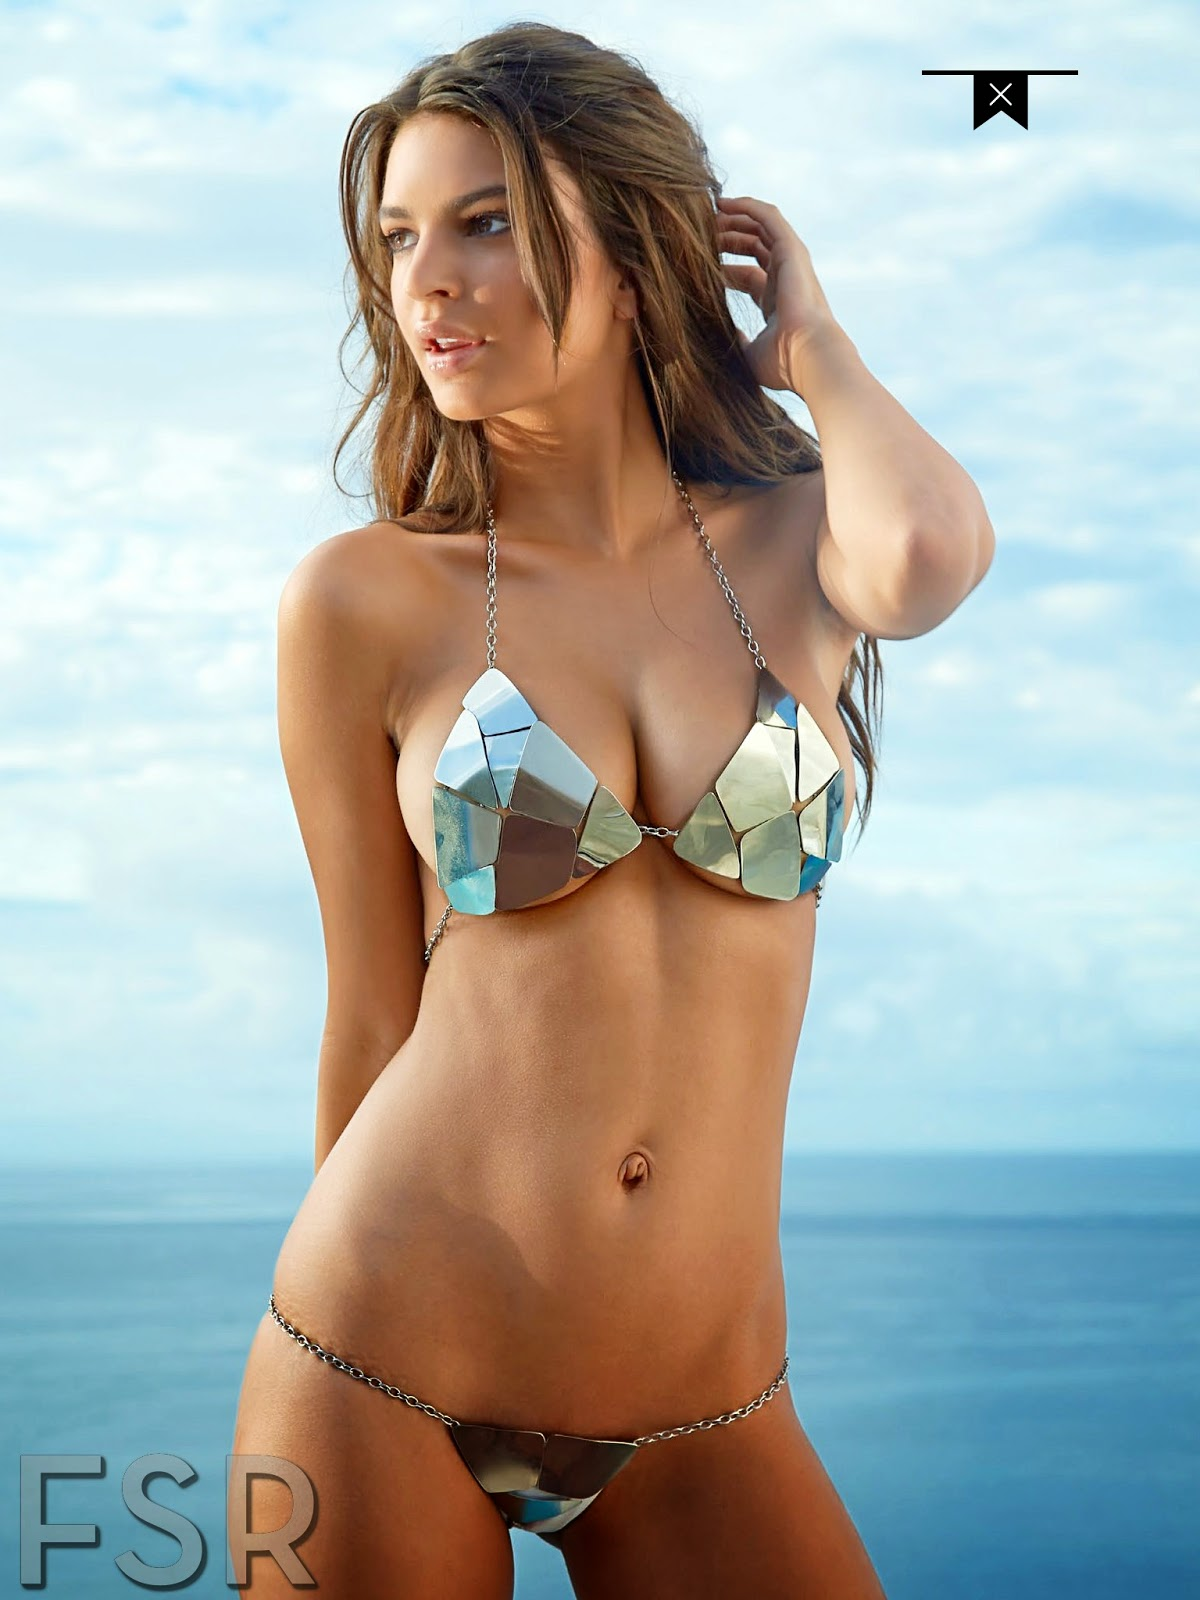 Rather valuable Sarah roemer bikini something and